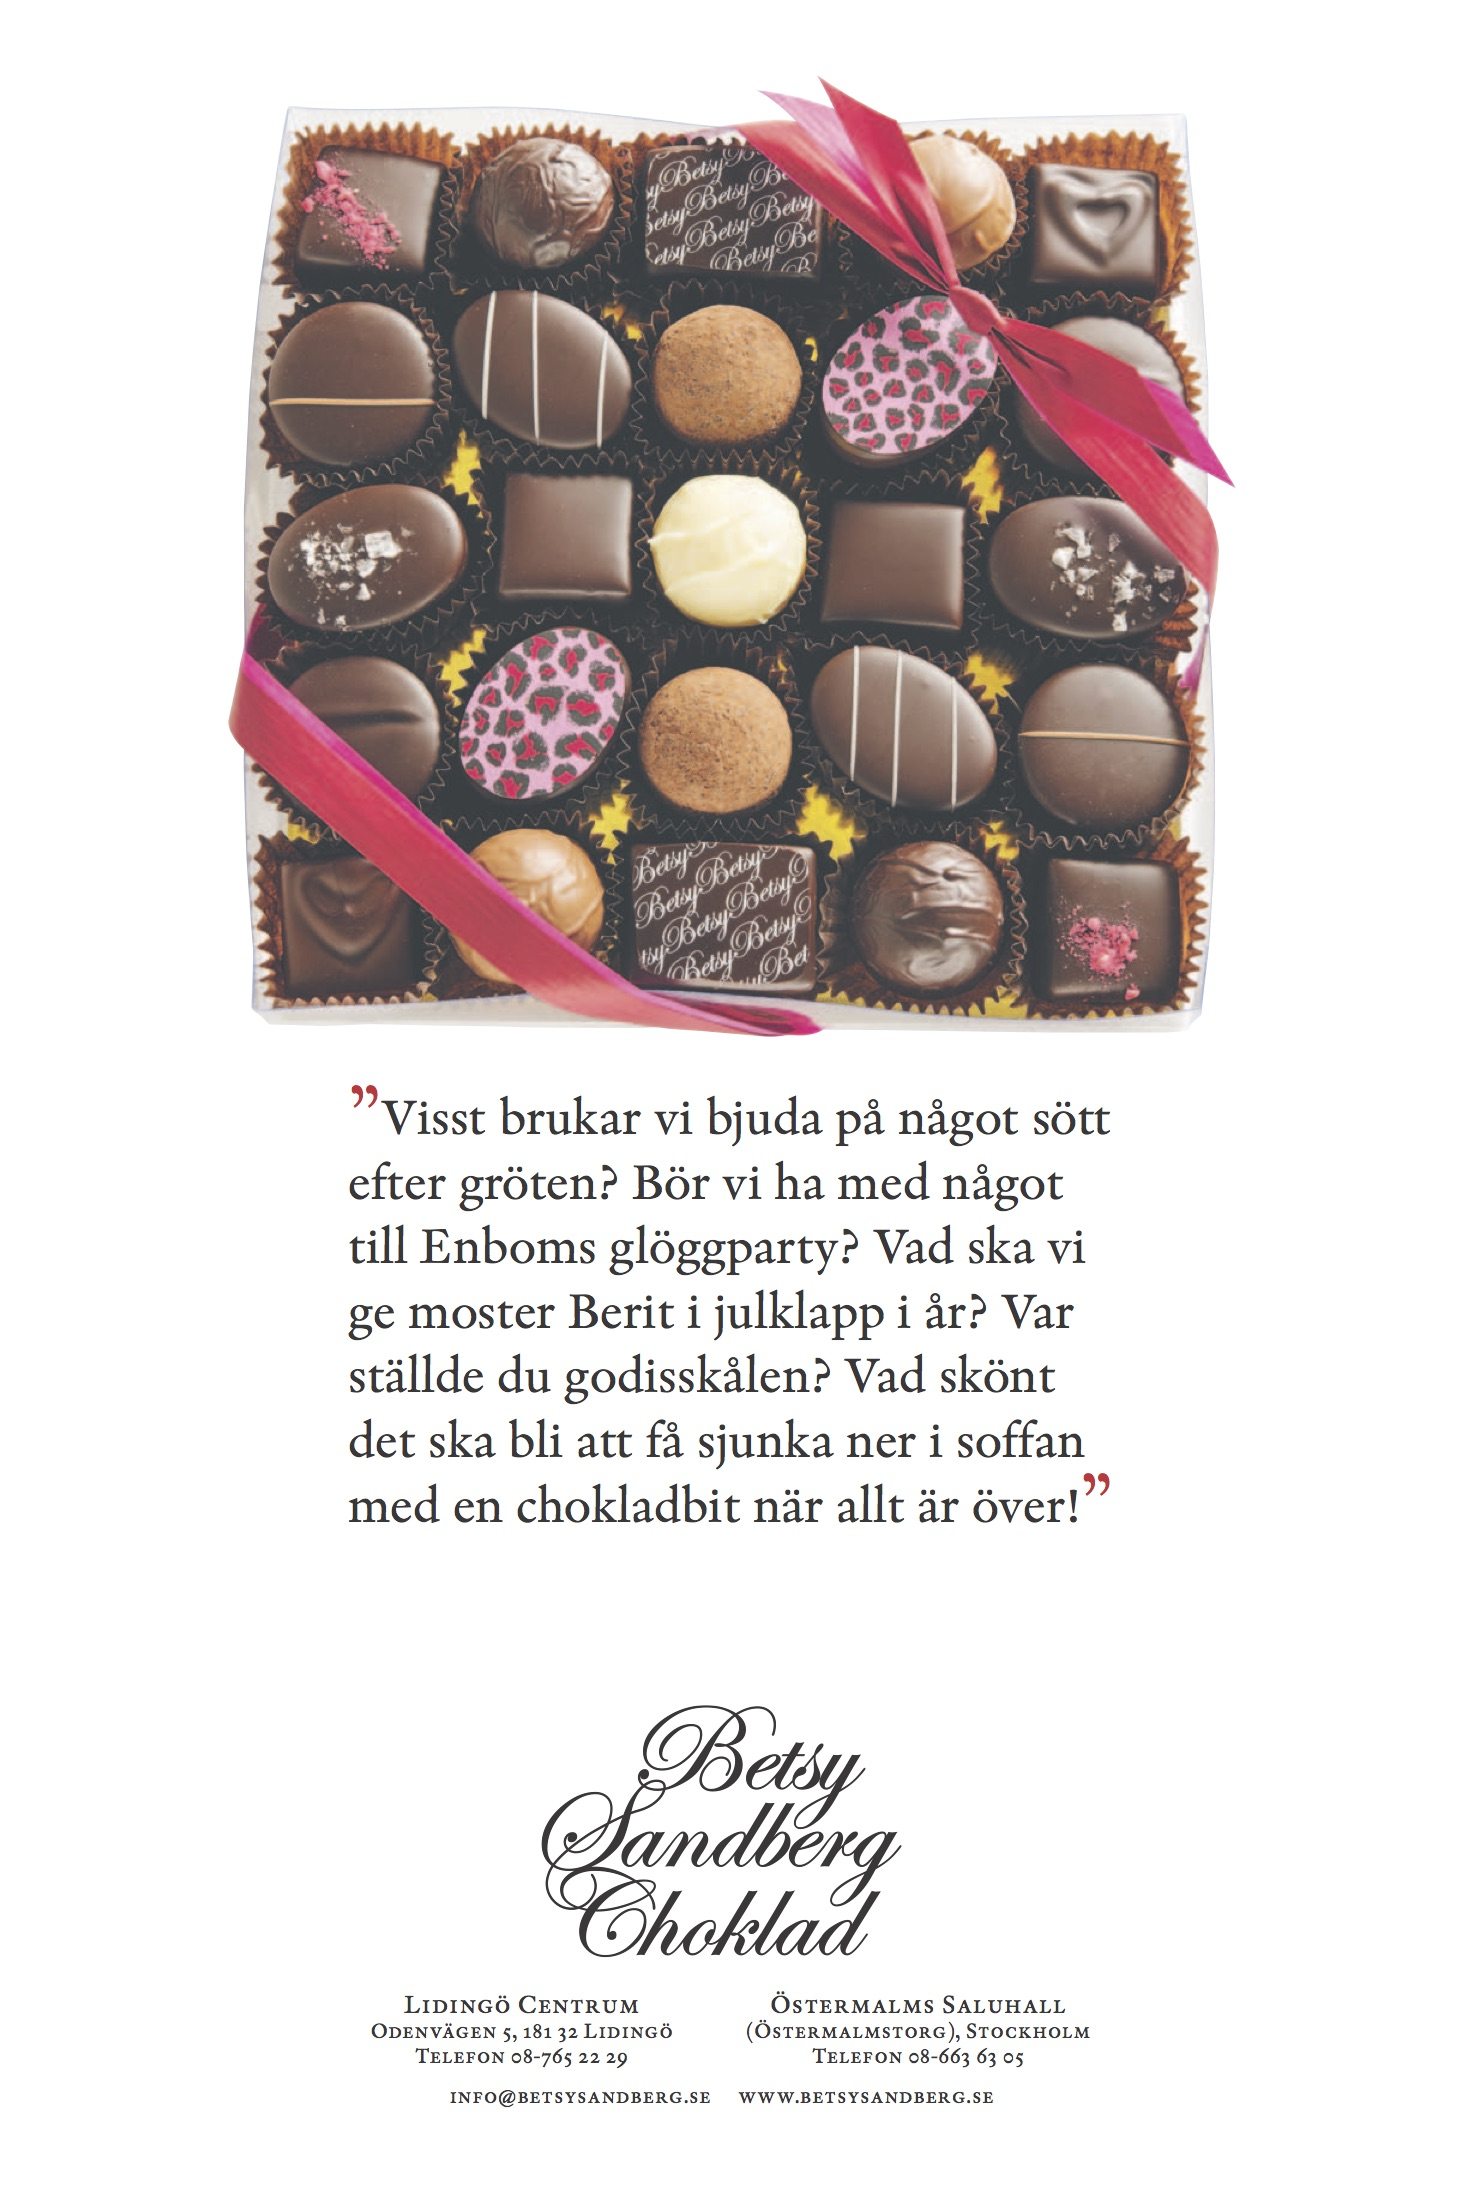 betsy sandberg choklad